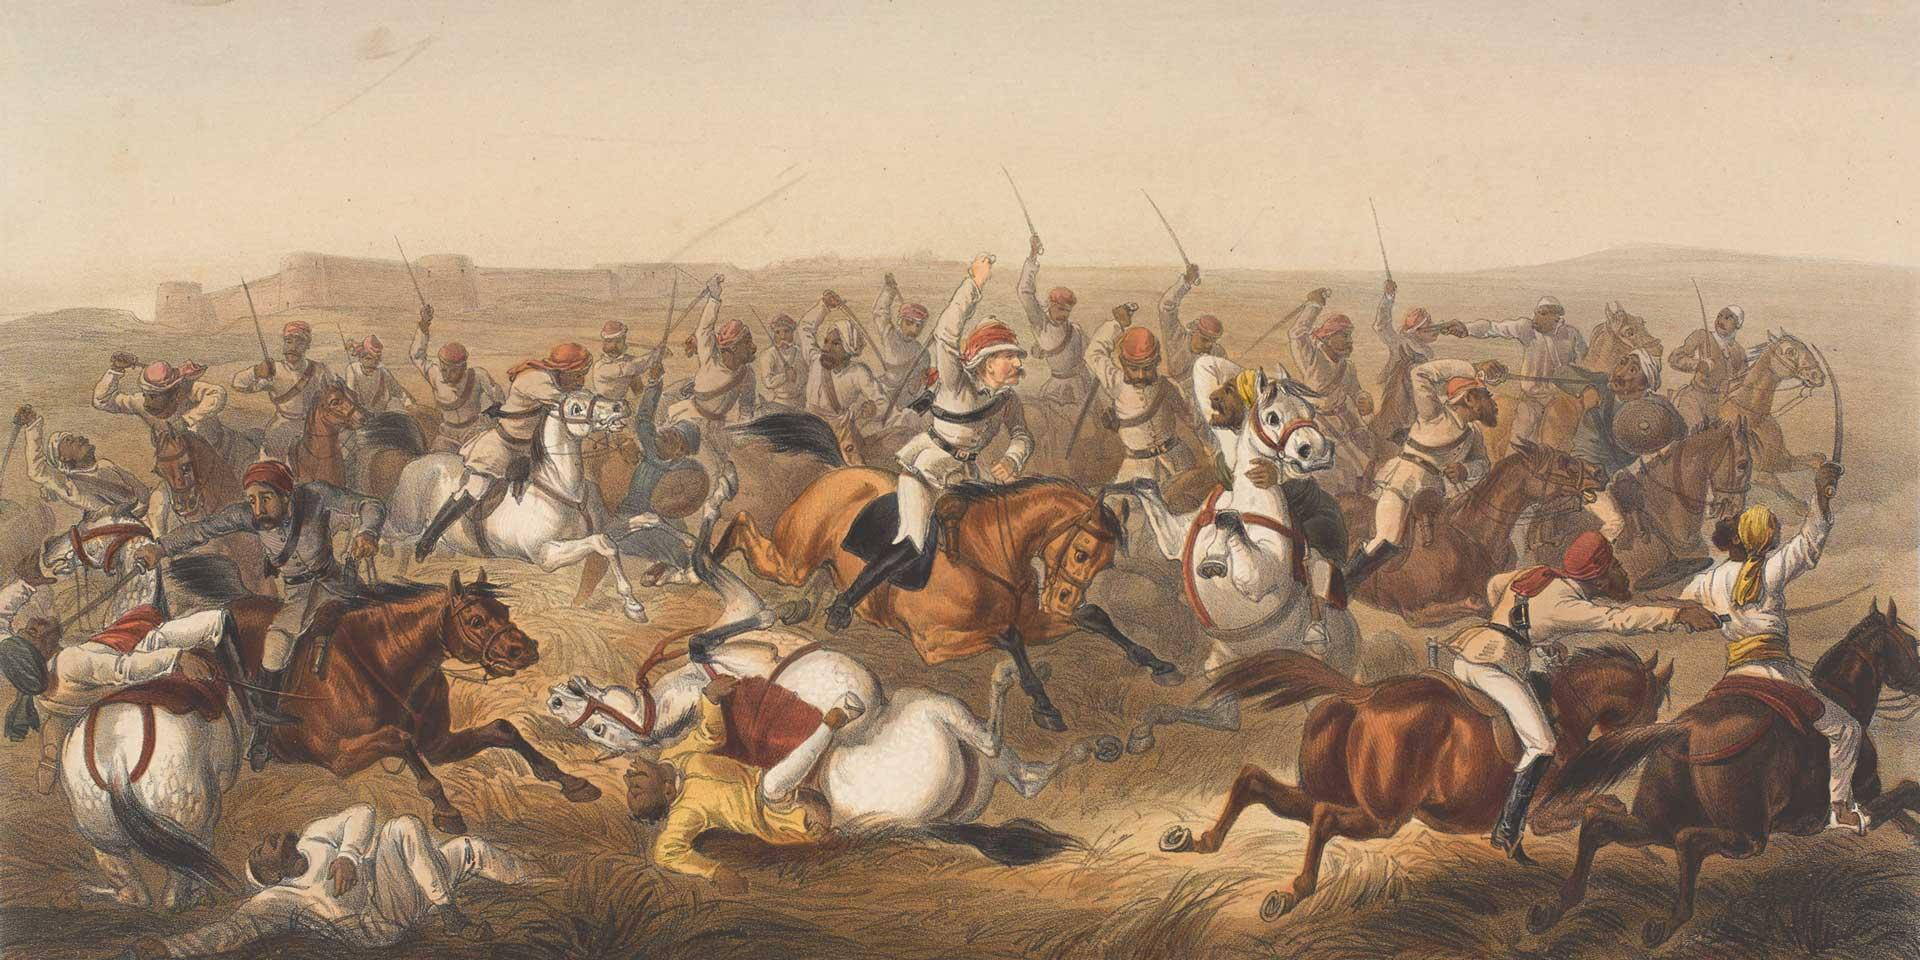 Hodson's Horse at Rhotuck, 1857